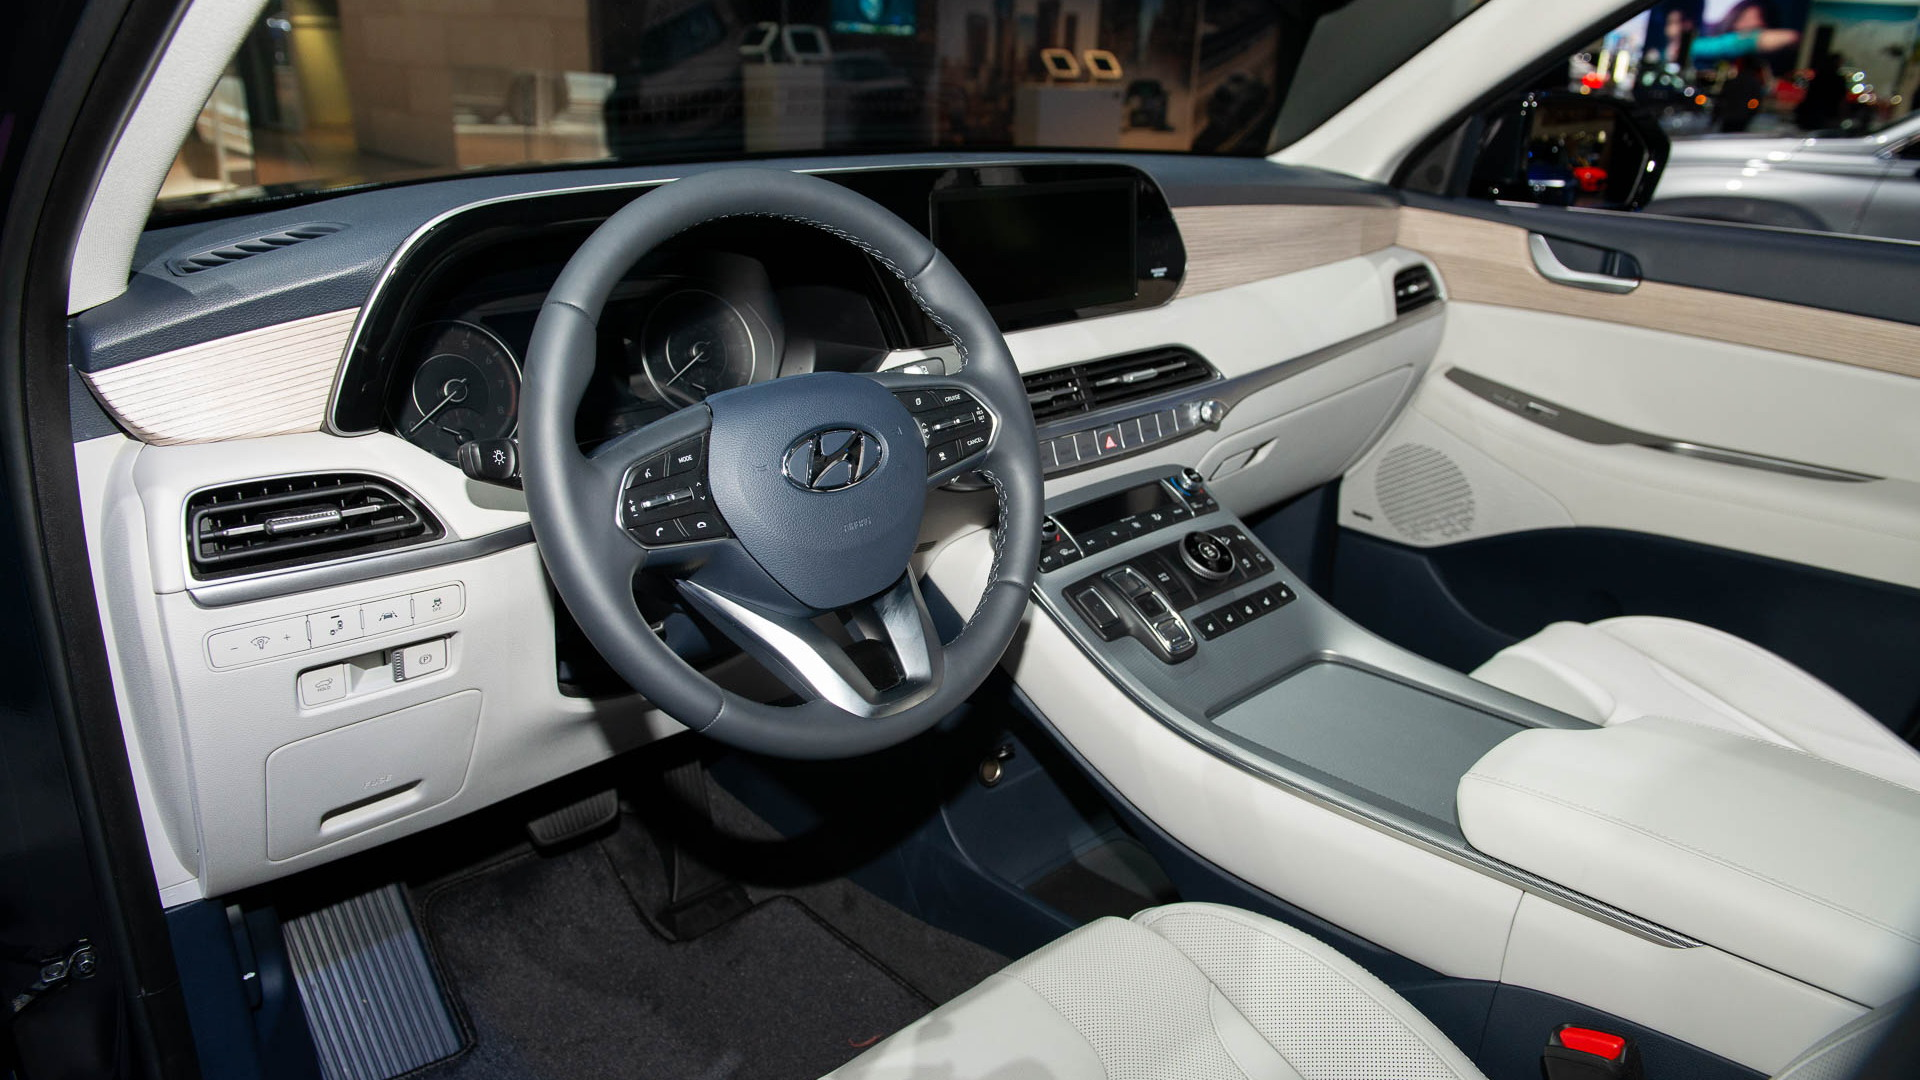 2020 Hyundai Palisade Trims | New 2019/2020 Hyundai